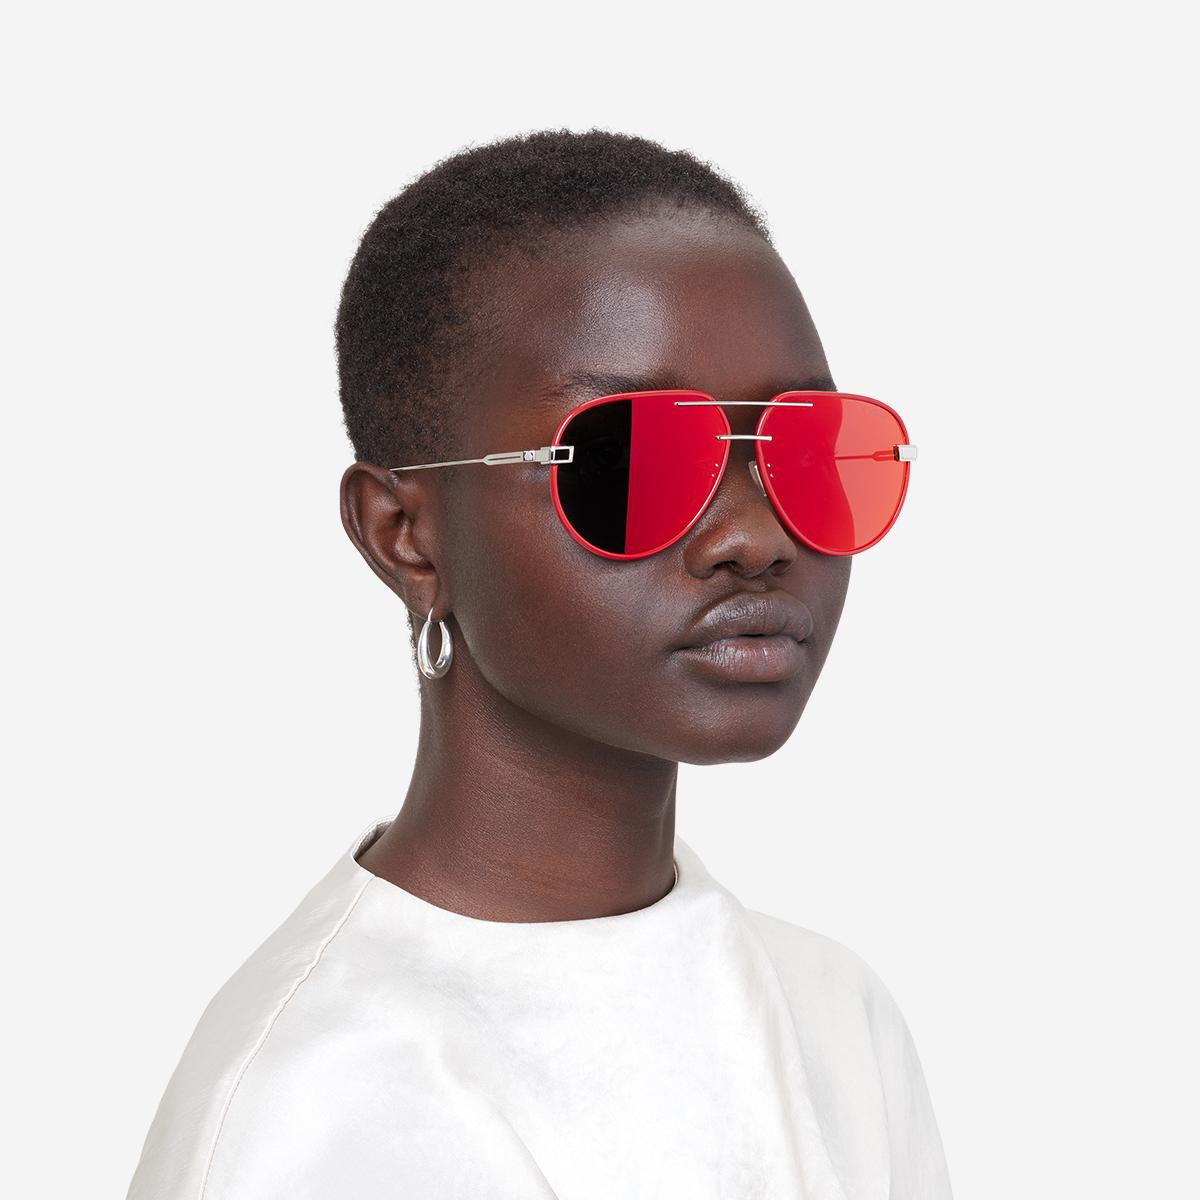 womenswear model wearing red reflective sunglasses